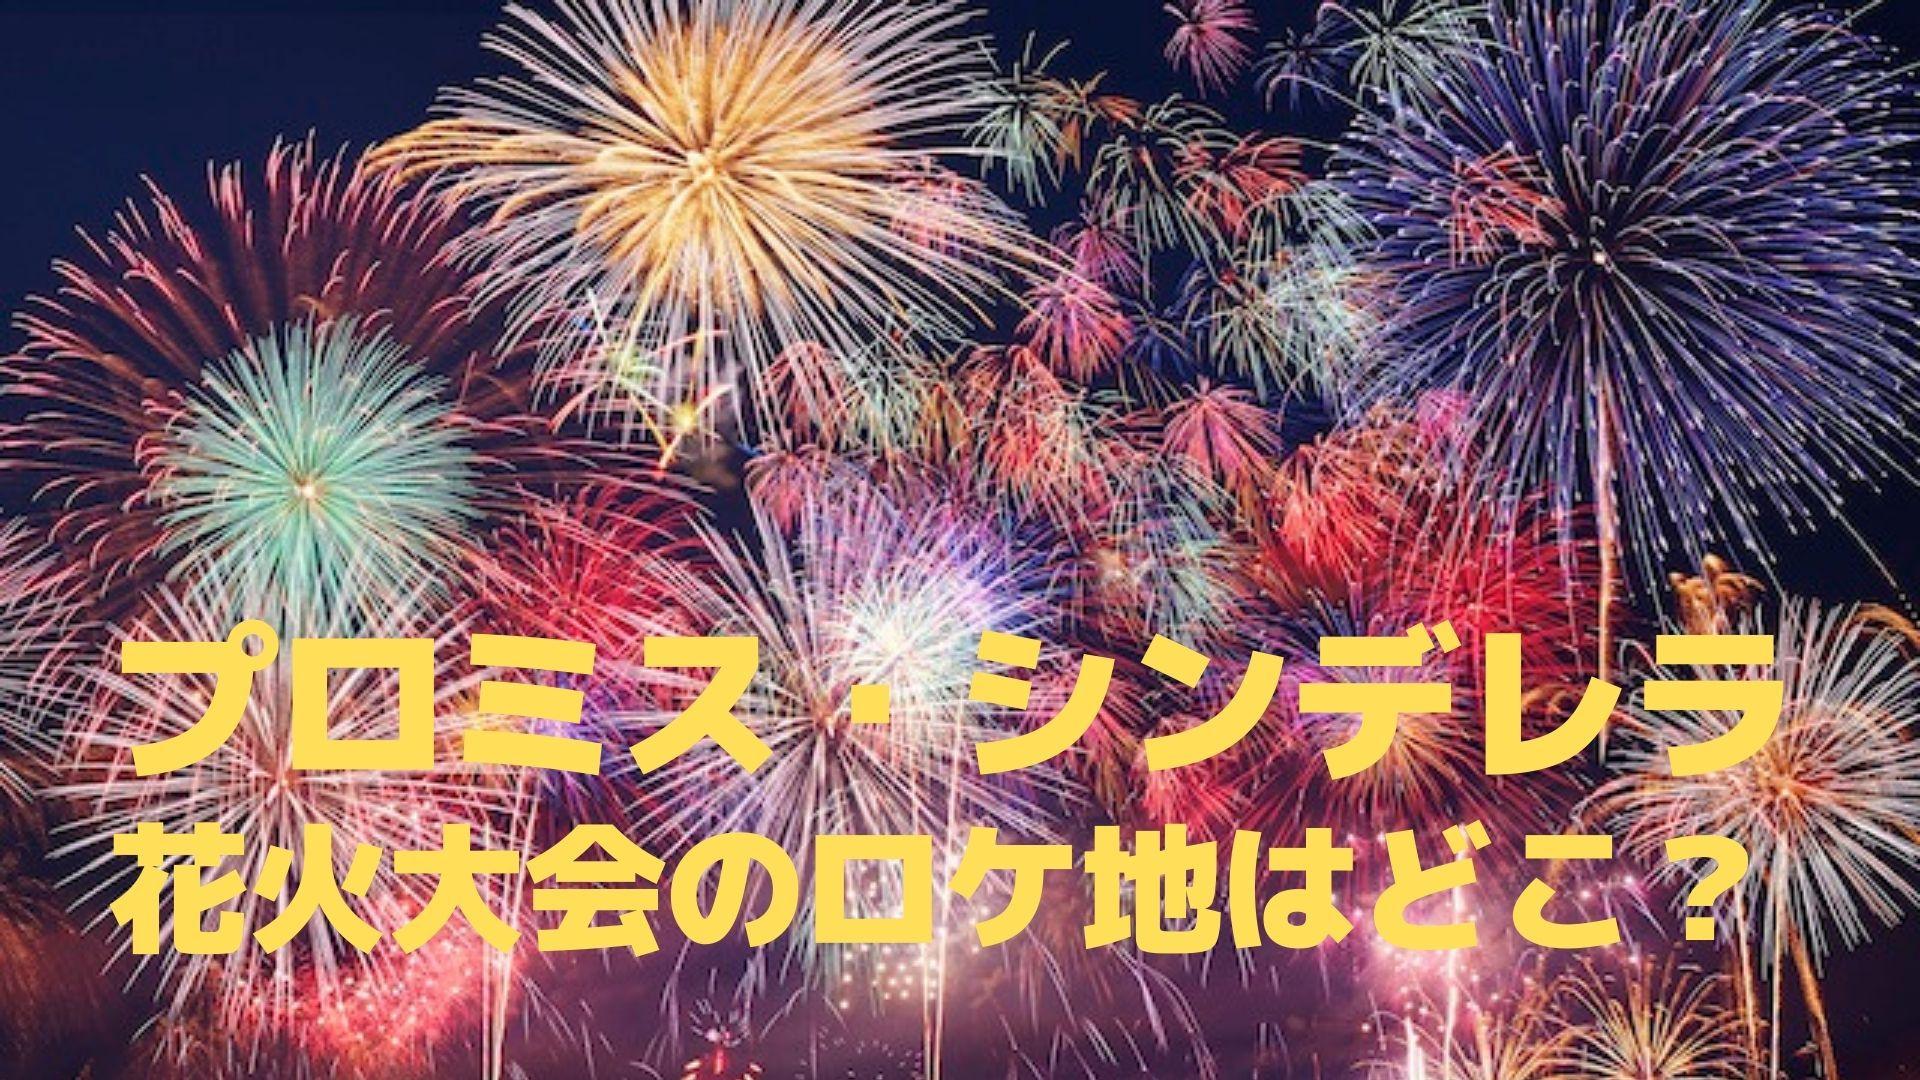 promise-cinderella-fireworks-display